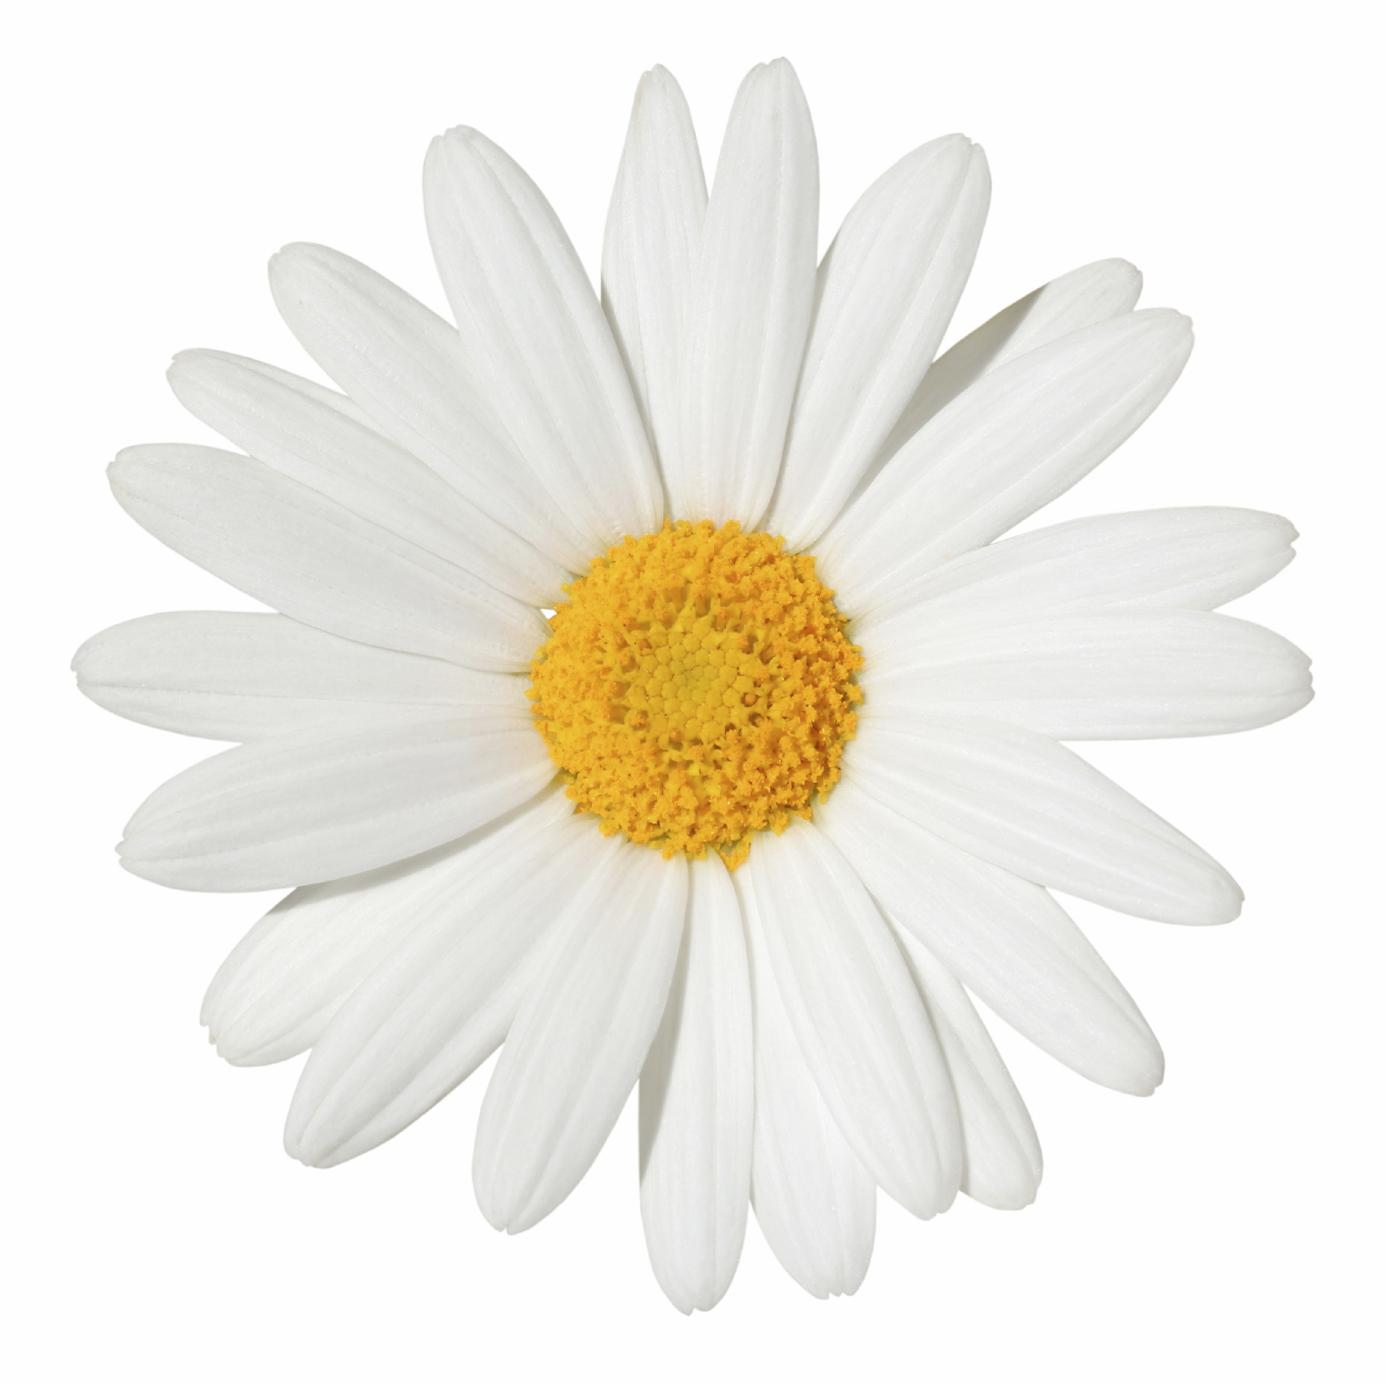 Gisela Gold line Pretty Daisy